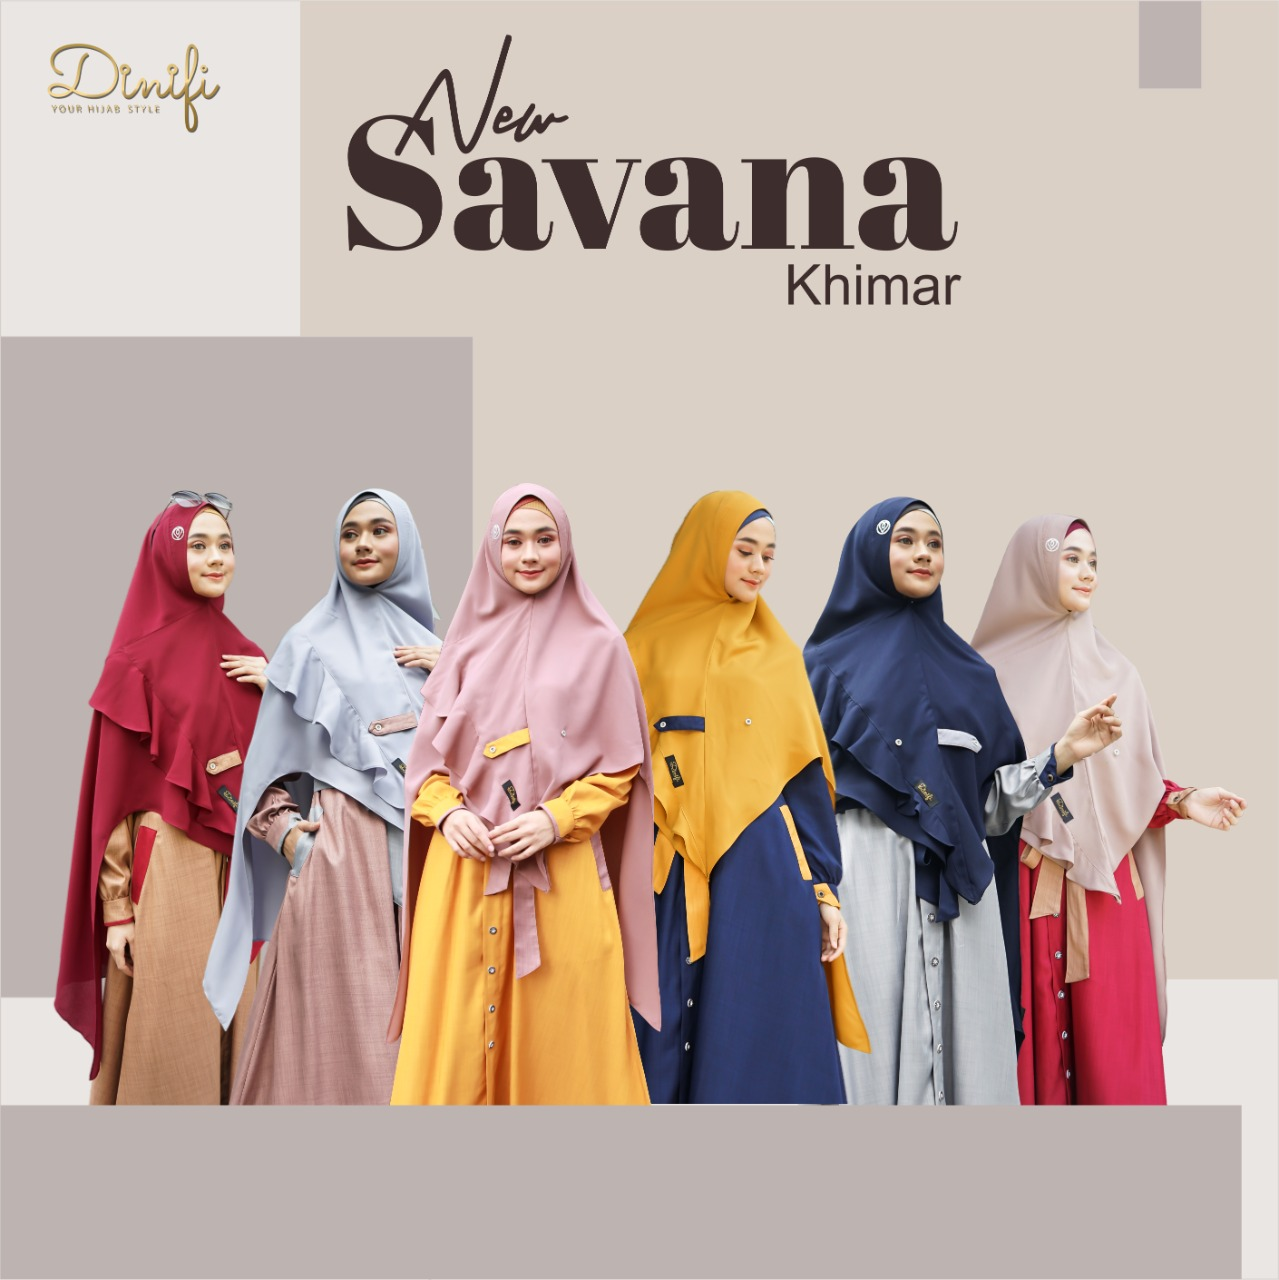 Khimar New Savana